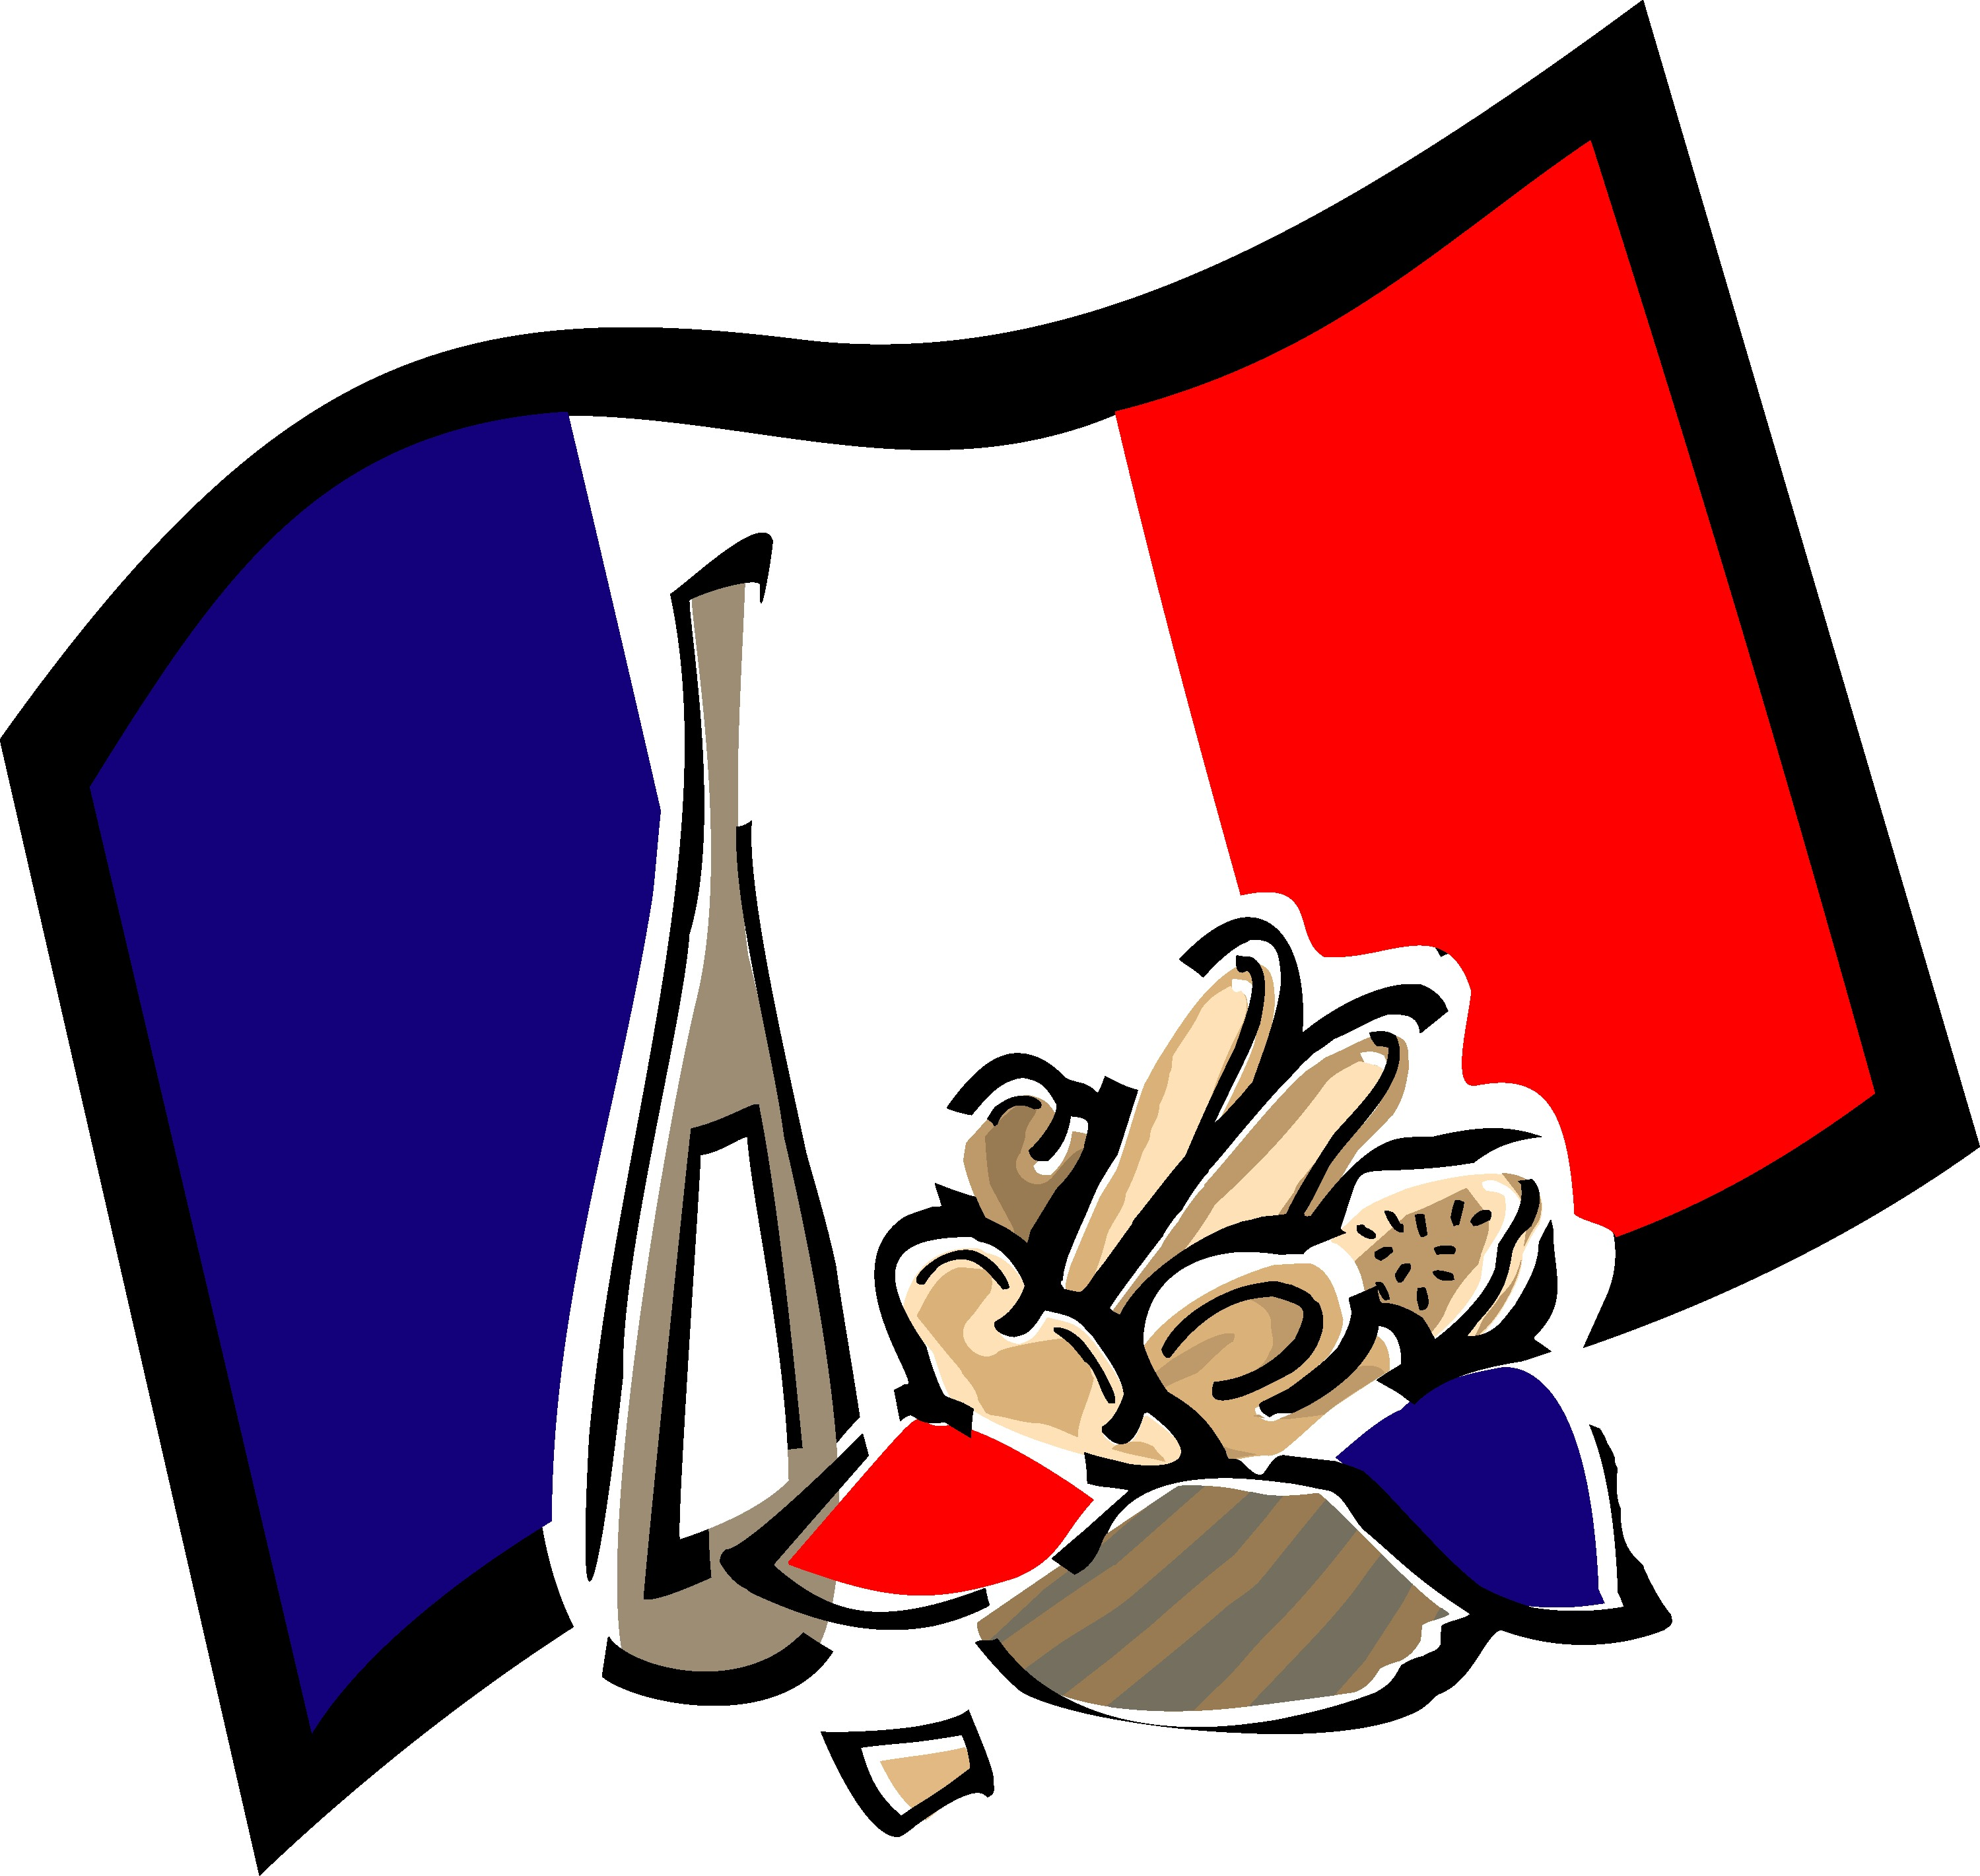 France Clipart & France Clip Art Images.